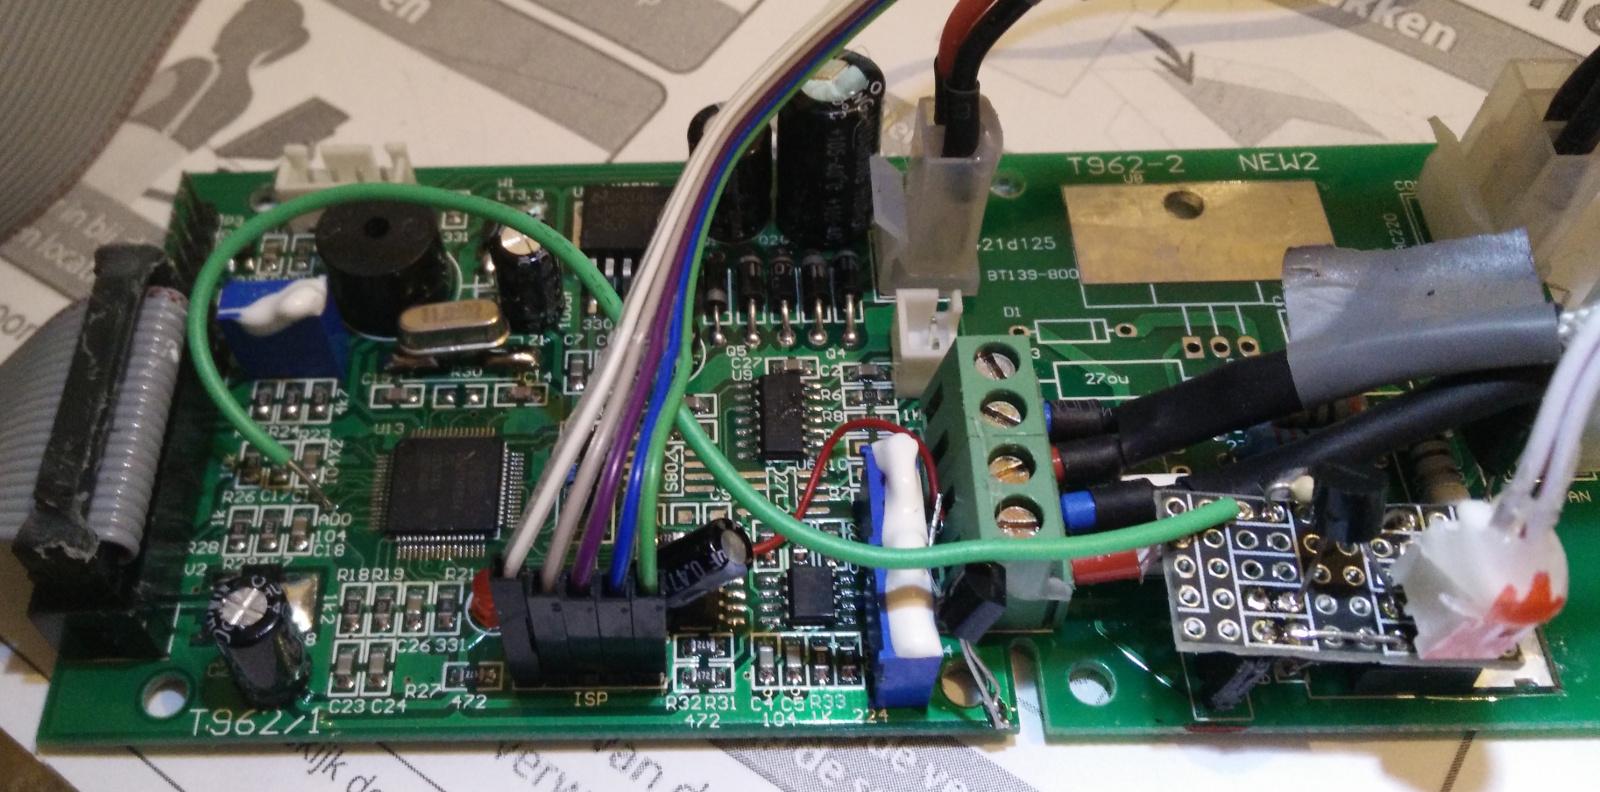 System fan mod with BC547B transistor